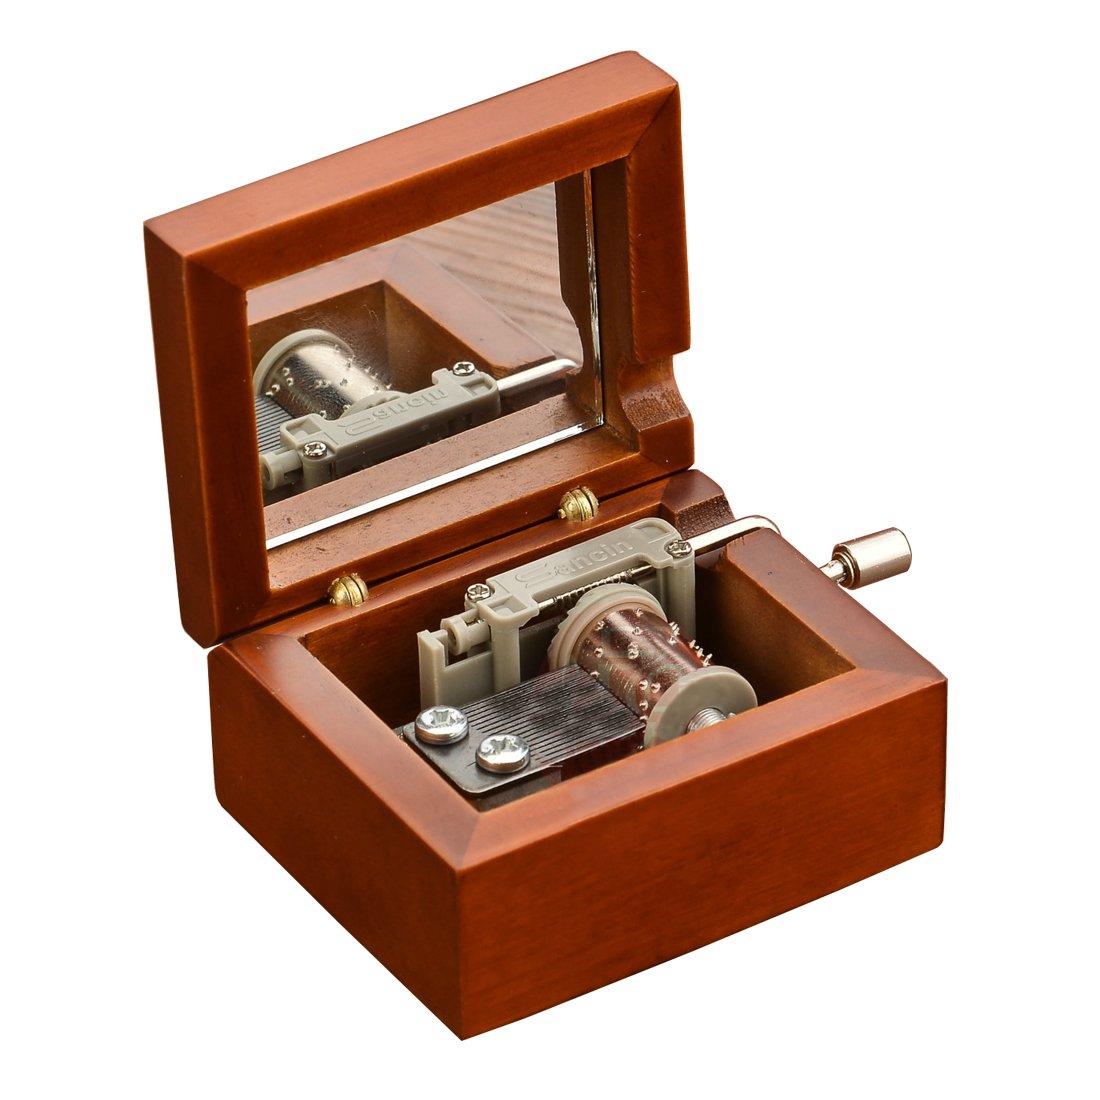 Laxury Mini Size Creative Wooden 18-note Hand-crankMusical Box, Musicl Toys, Tune:Happy Birthday Shenzhen Youtang Trade Co. Ltd MZ50-A38BDJ